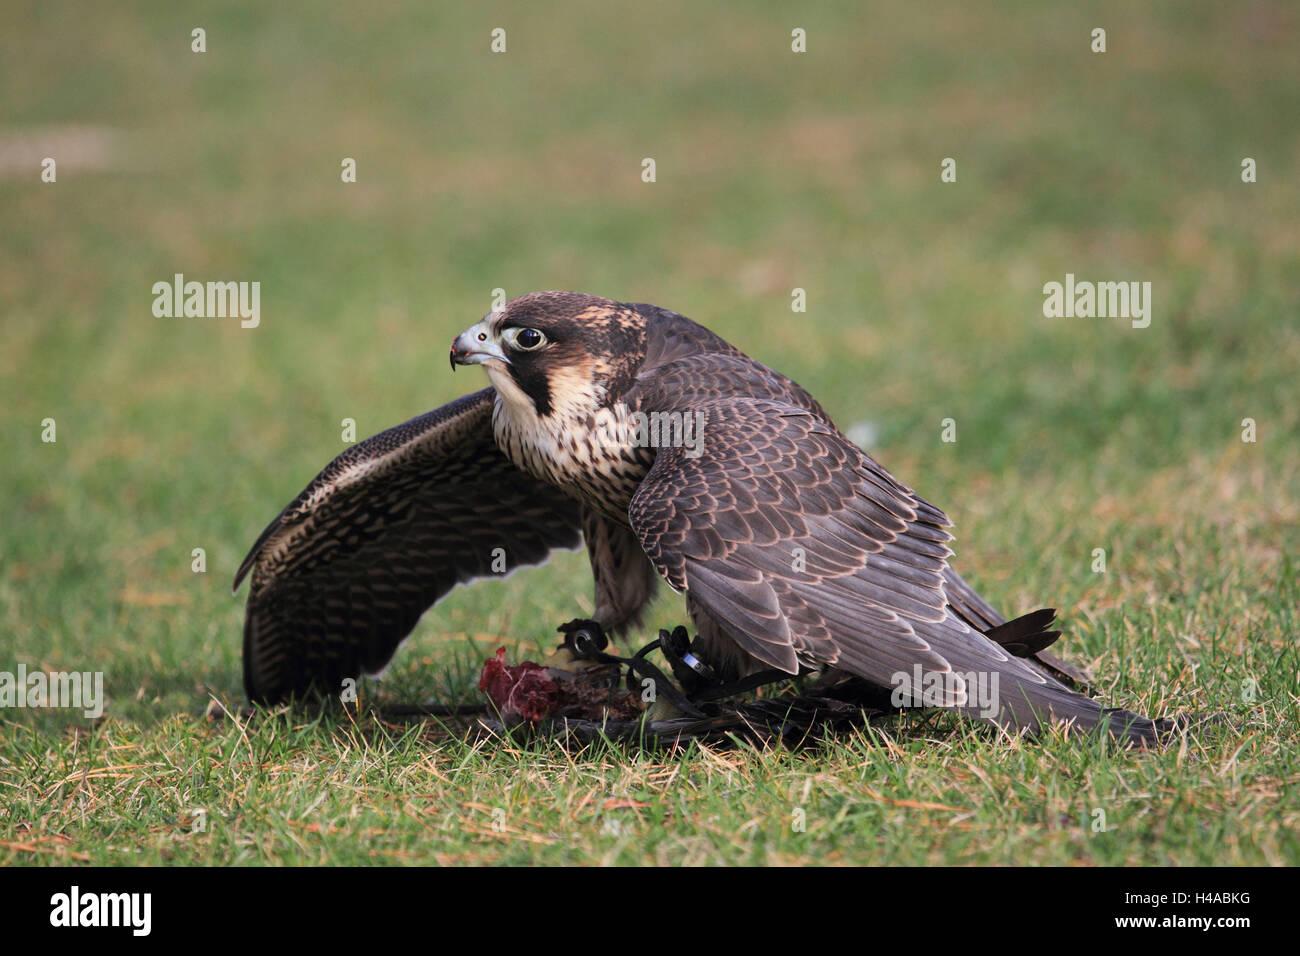 Peregrine falcon with prey, - Stock Image